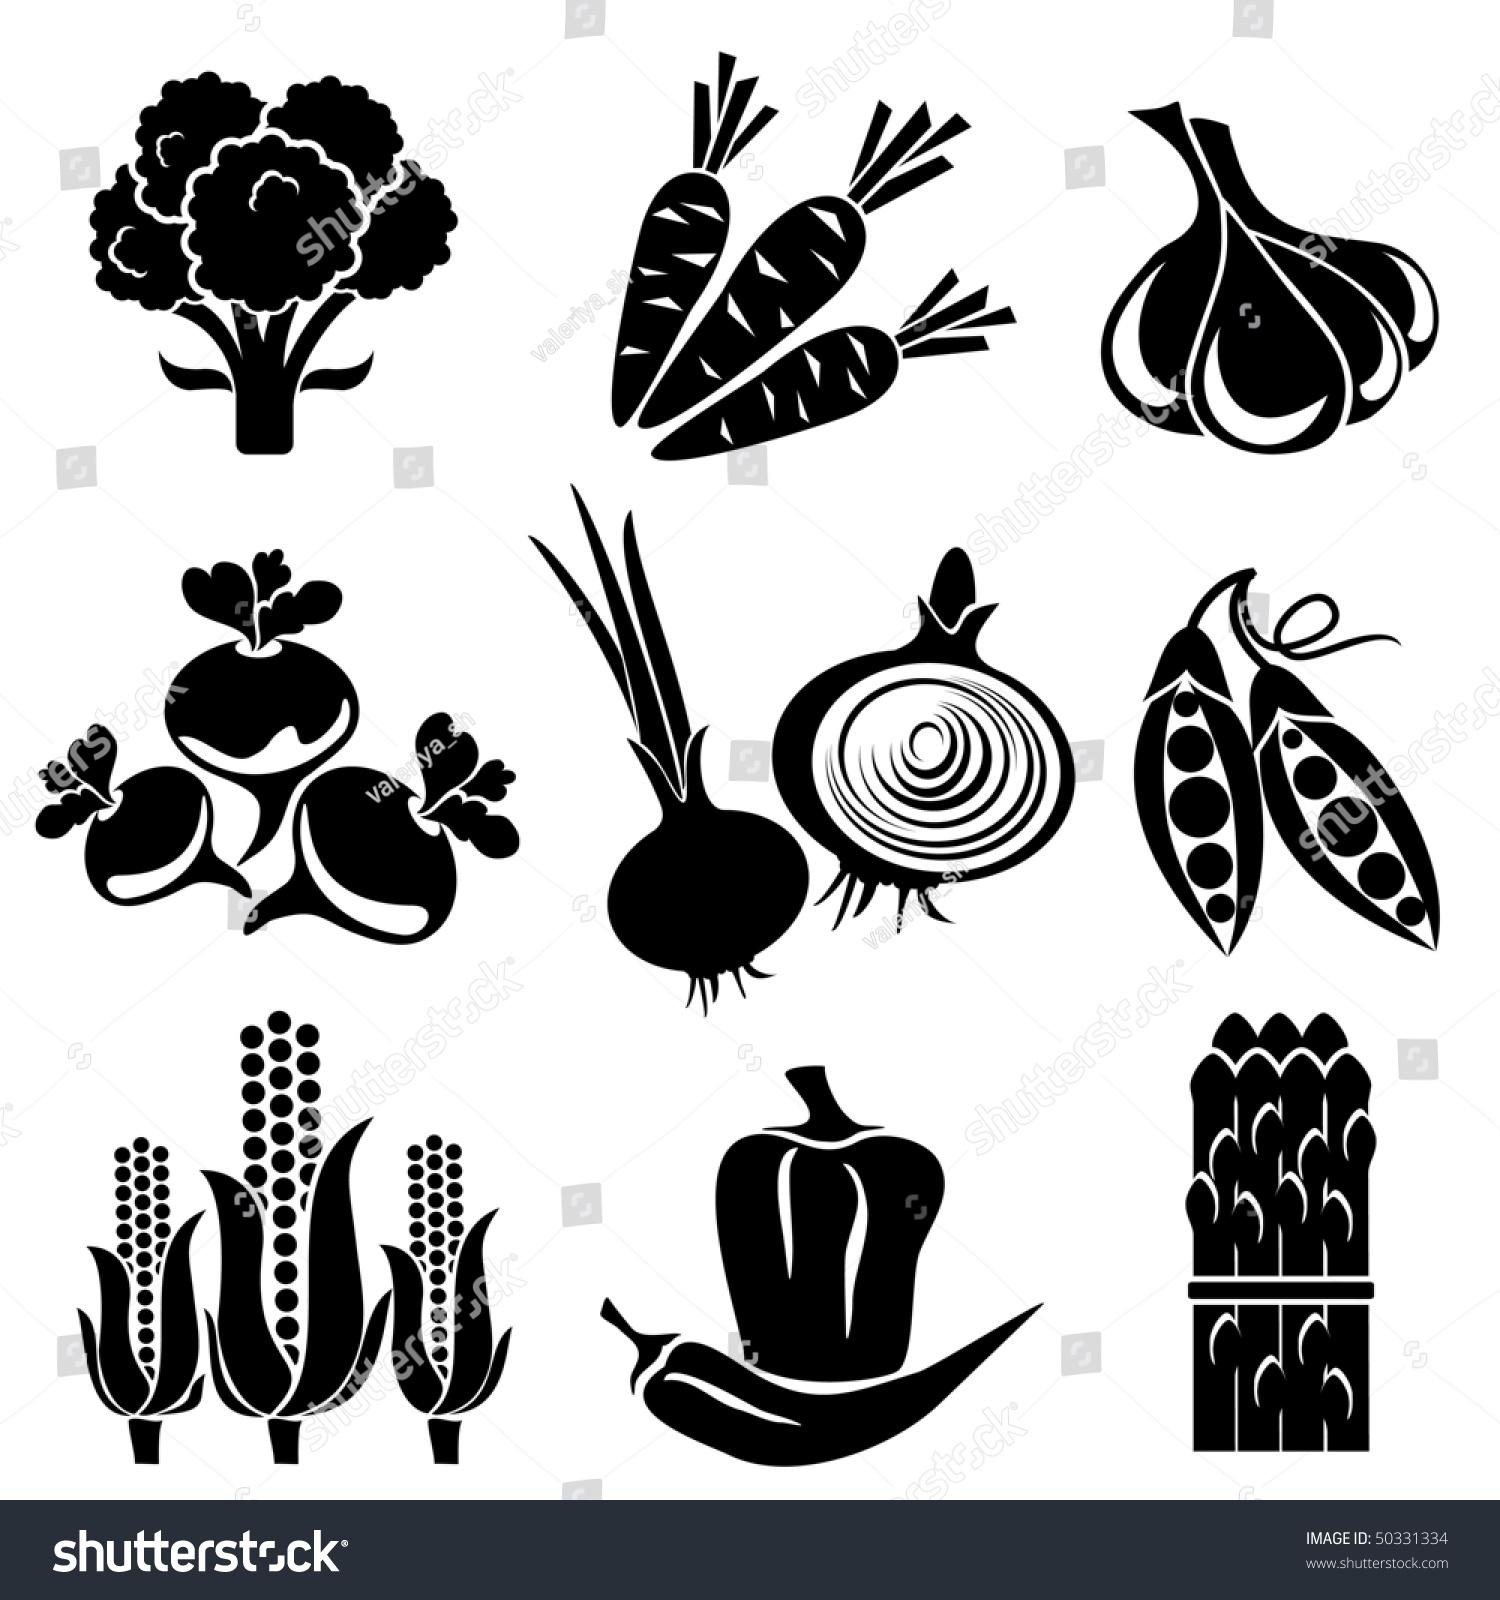 vegetarian silhouette